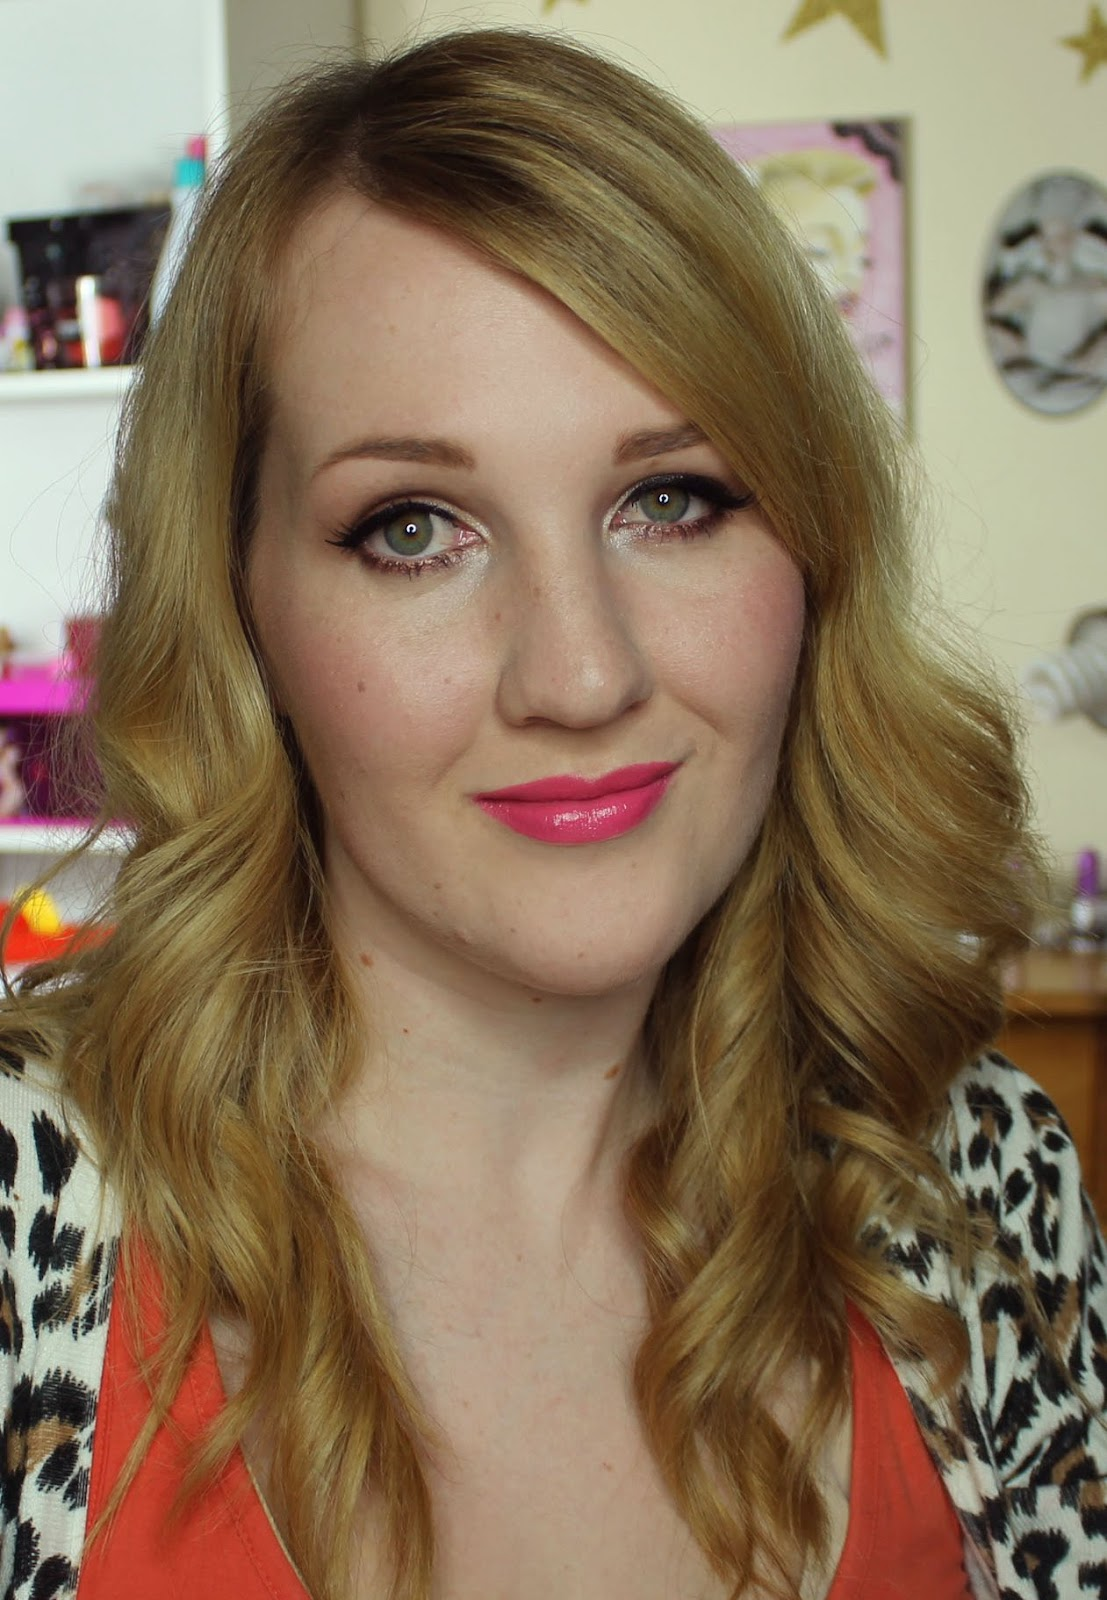 ZA Vibrant Moist Lipstick - RS444 swatches & review